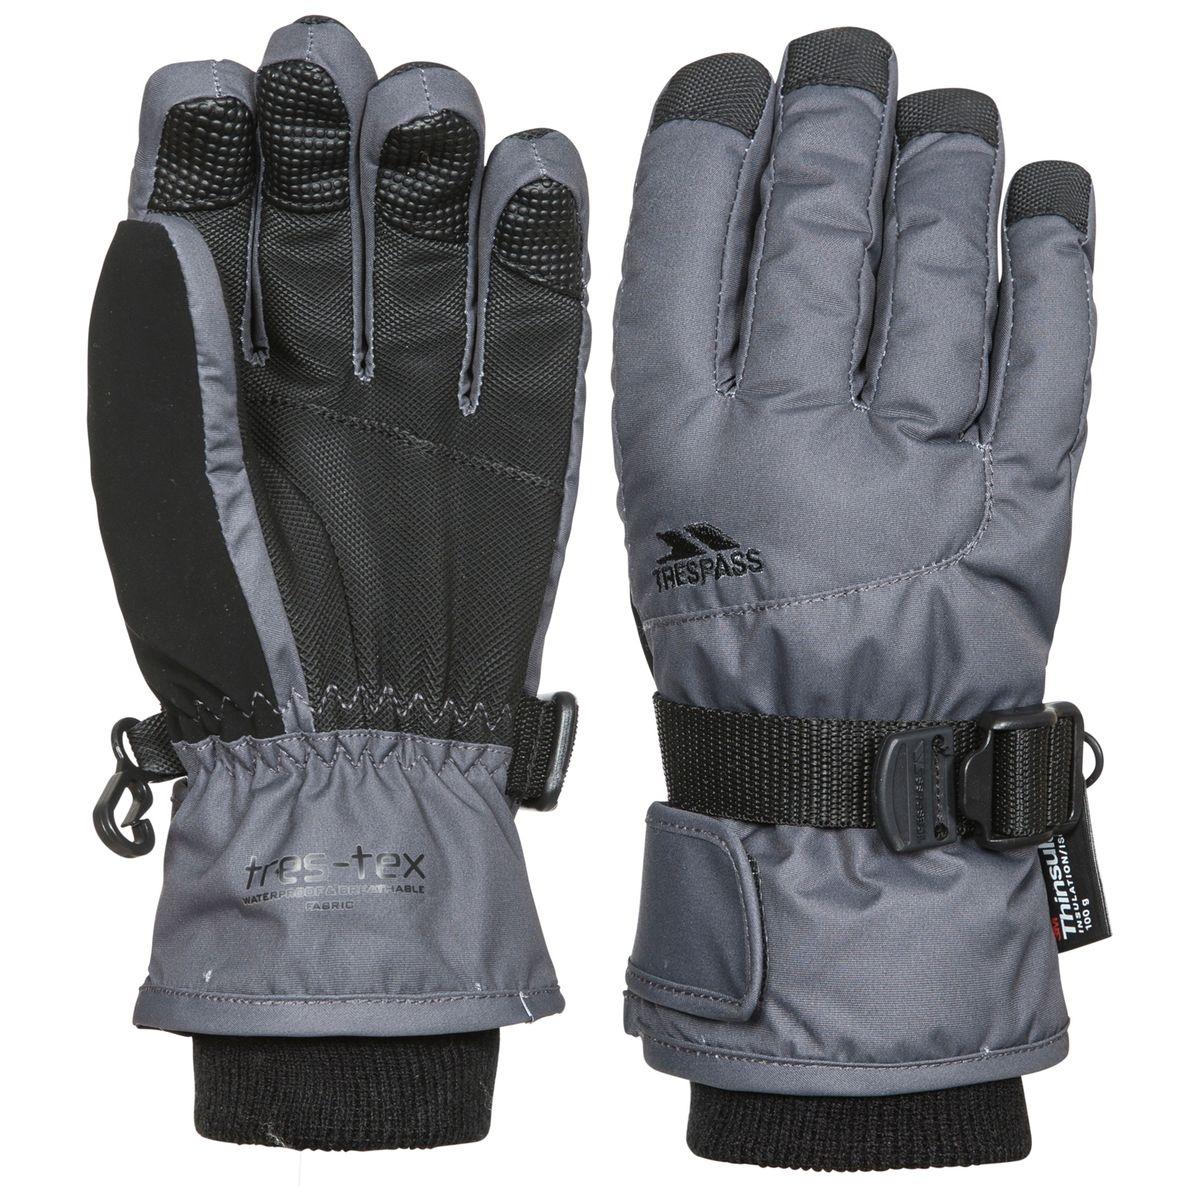 ERGON II - gants technique ski - enfant